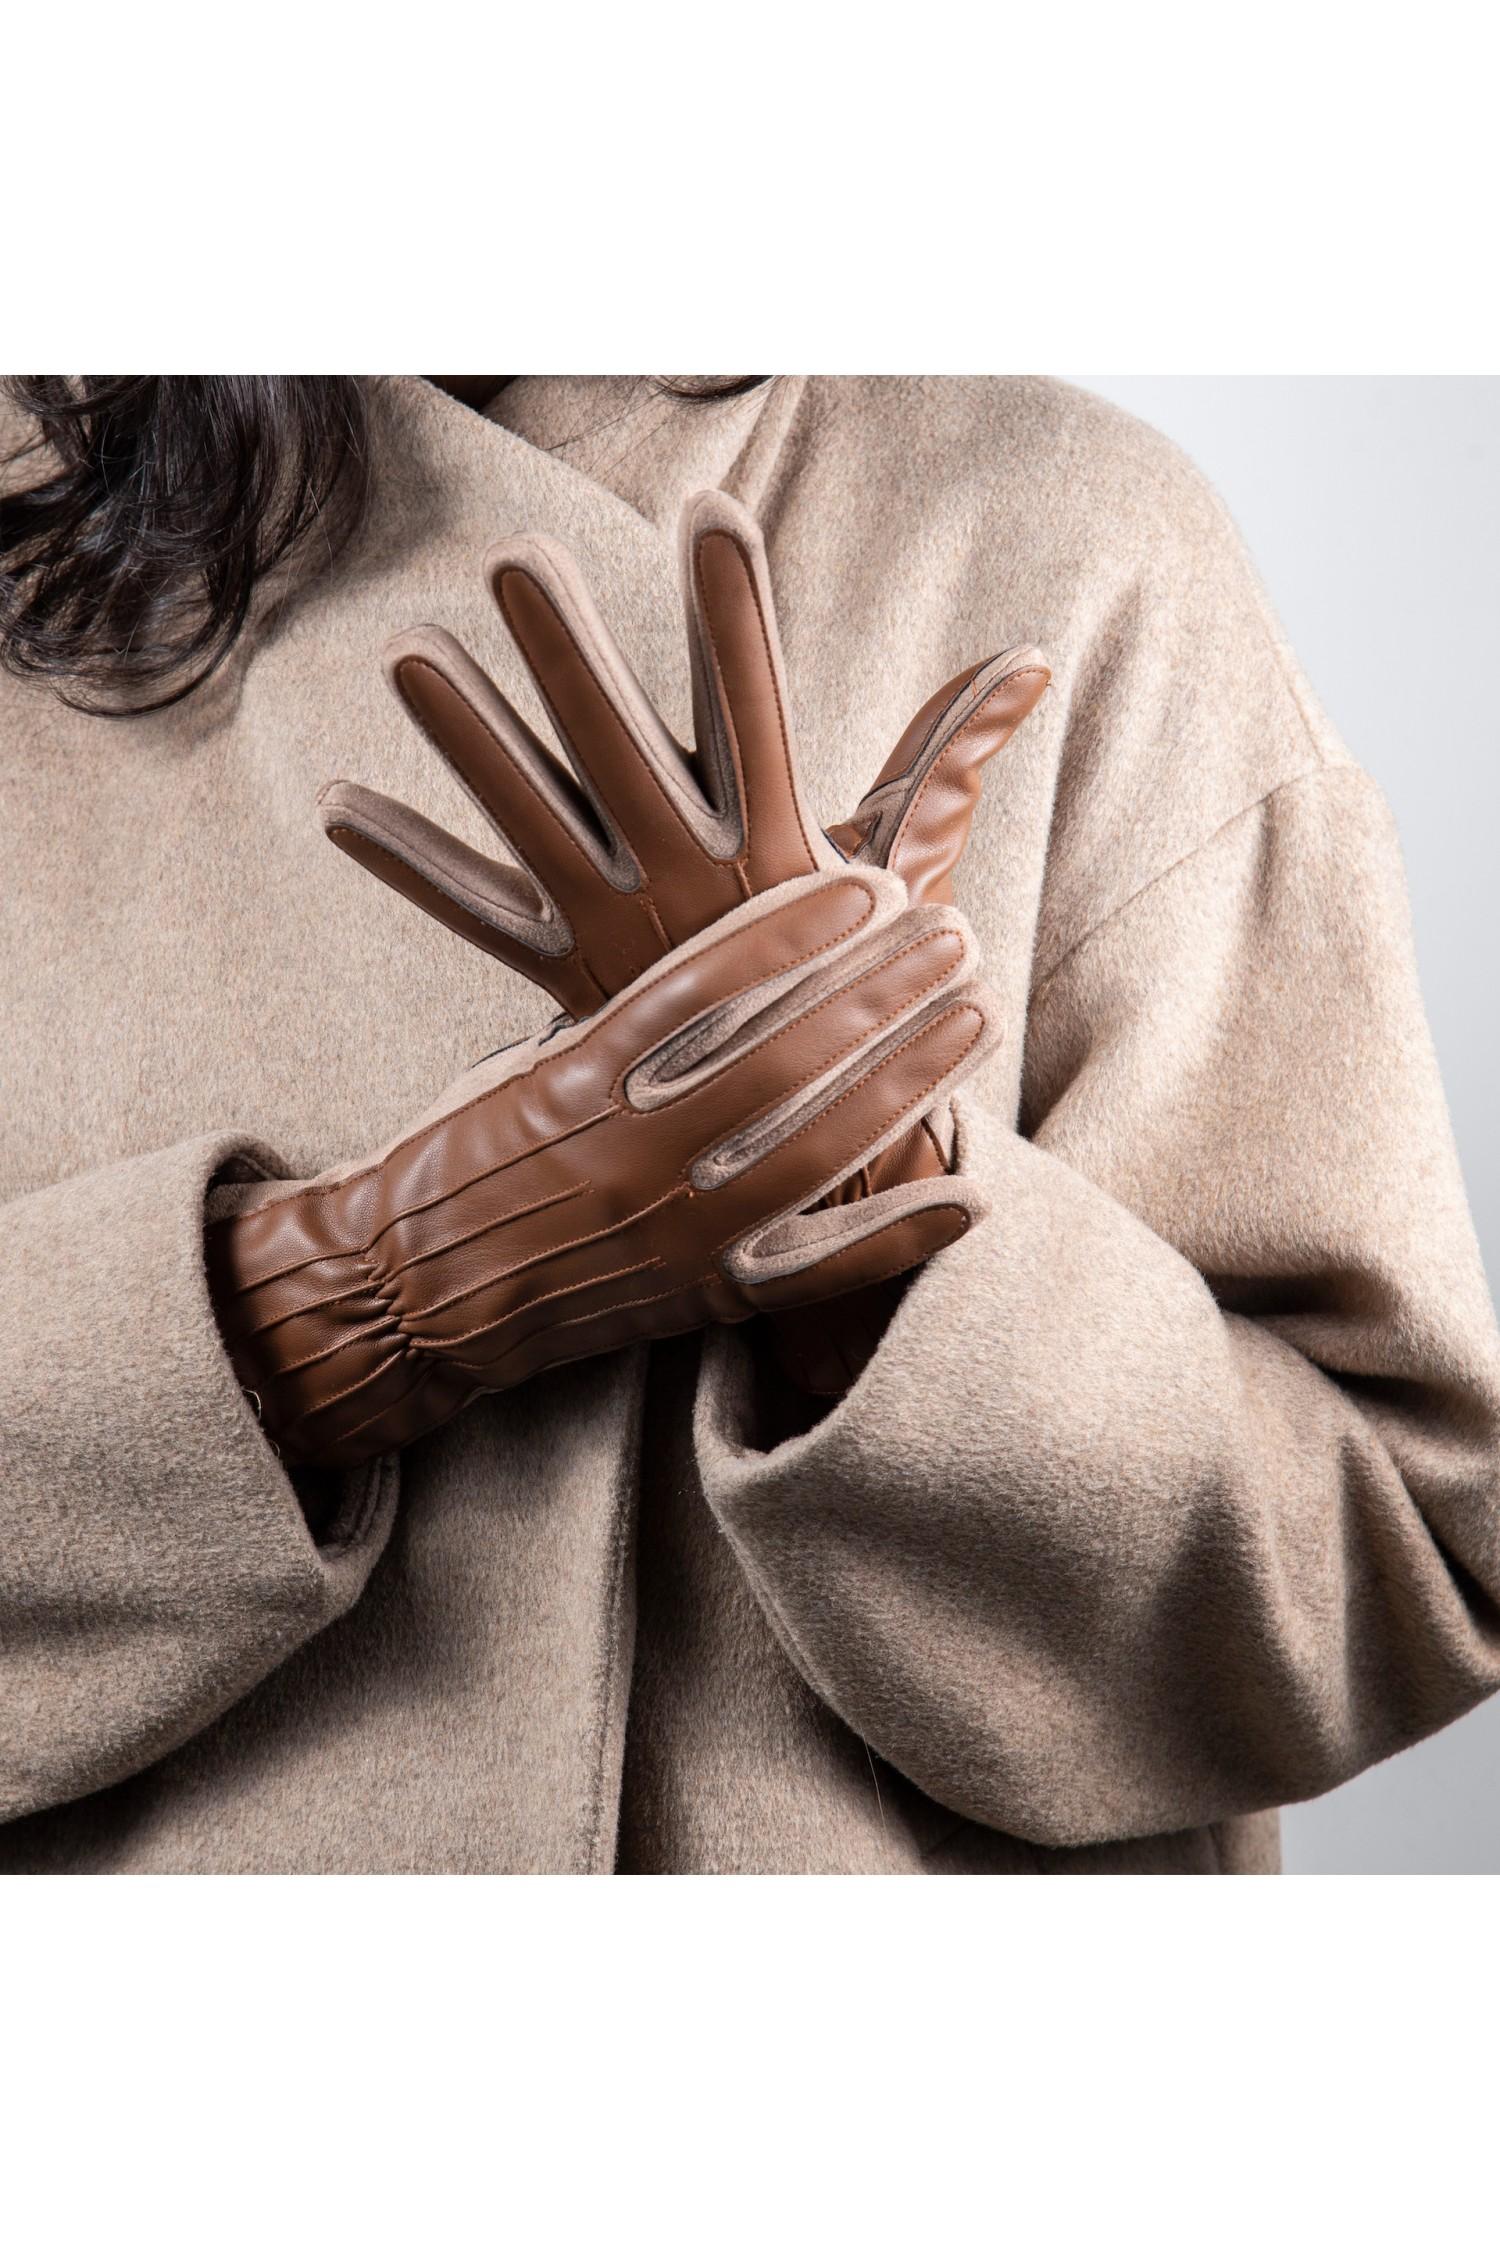 Manusi dama din piele naturala G04-02-CUOIO